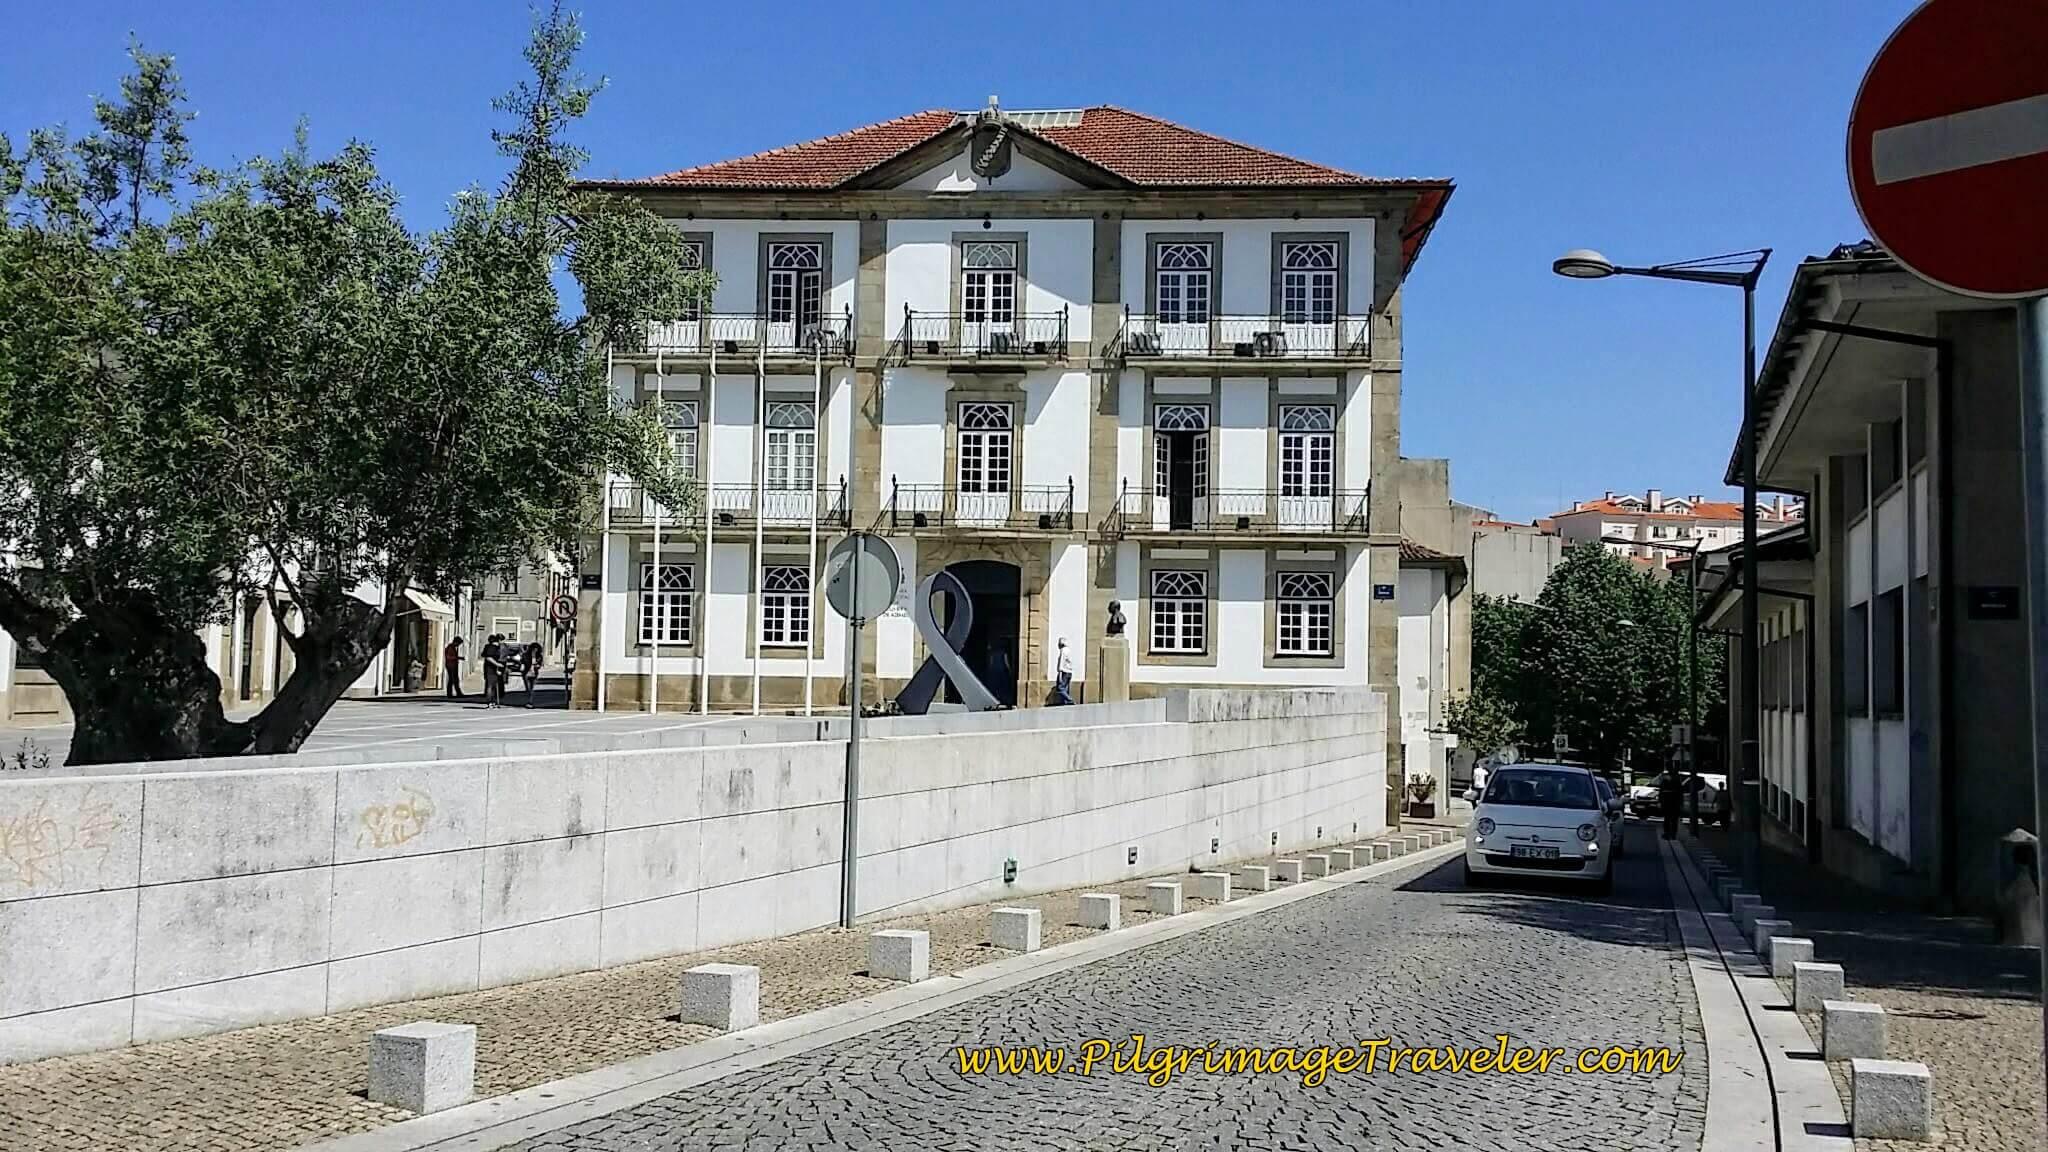 Nearing Center of Oliveira de Azeméis on Rua do Emigrante on day thirteen of the Camino Portugués